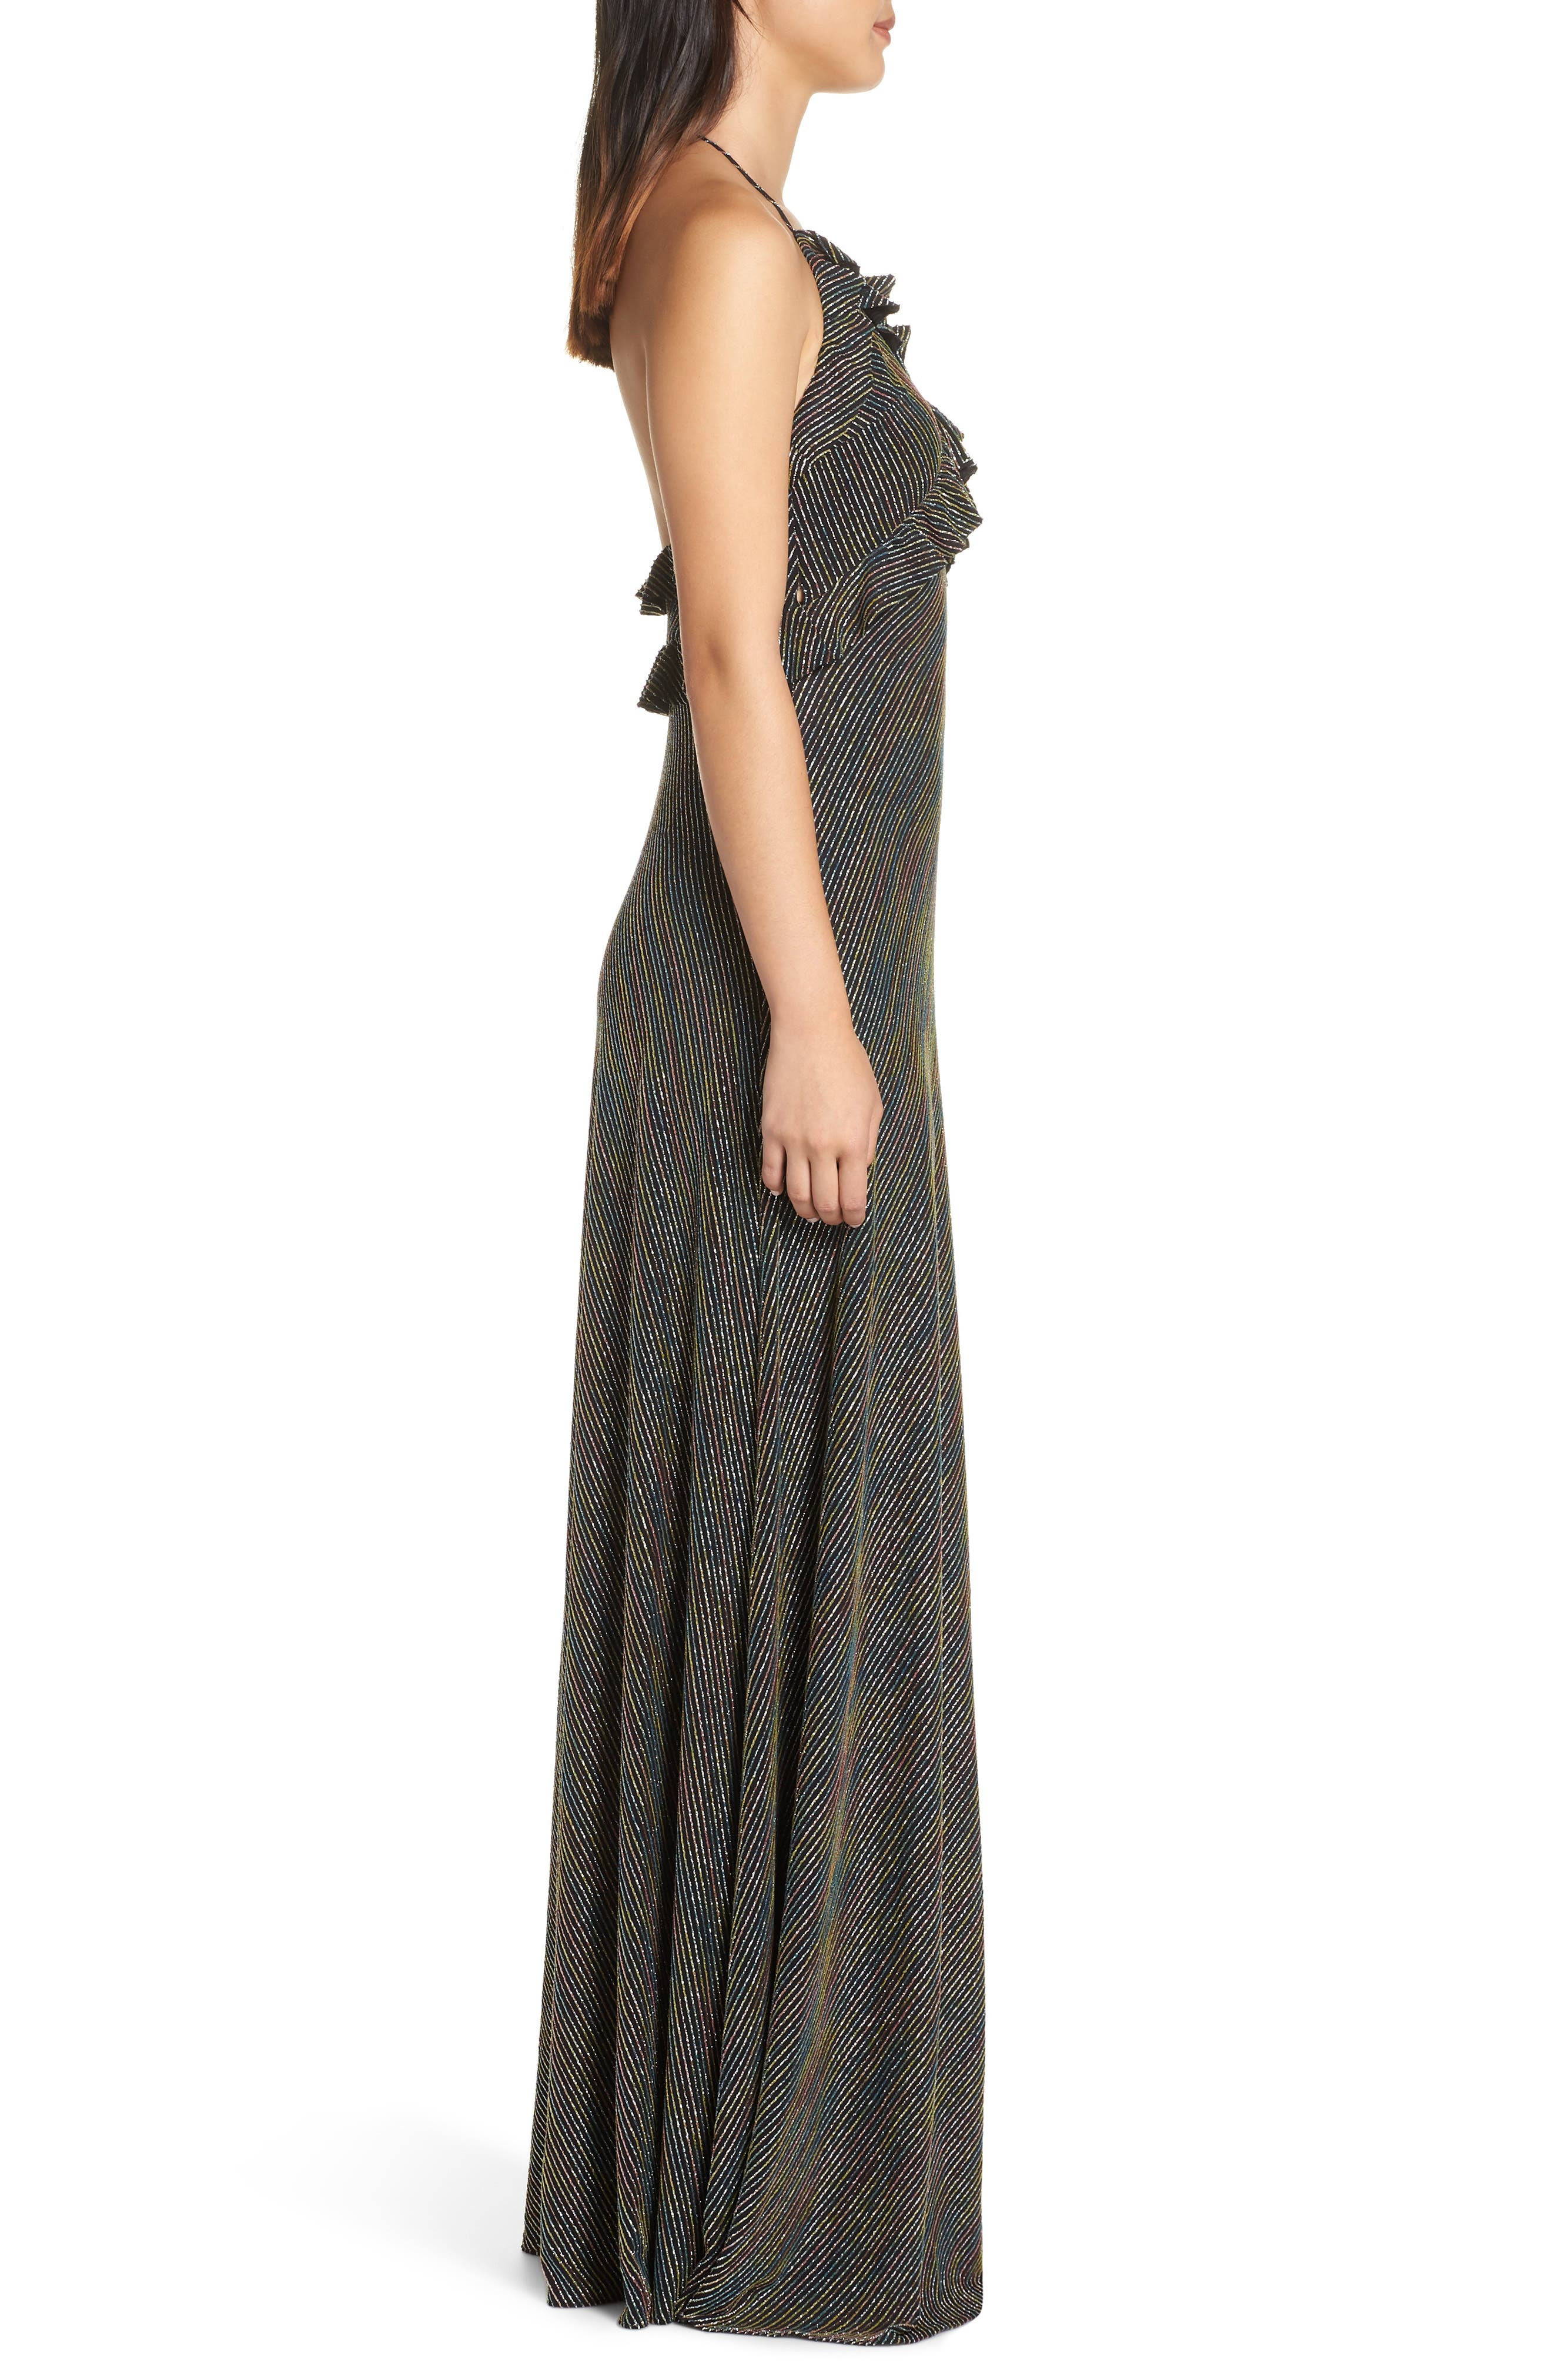 JILL JILL STUART,                             Marjan Metallic Knit Gown,                             Alternate thumbnail 3, color,                             SILVER MULTI